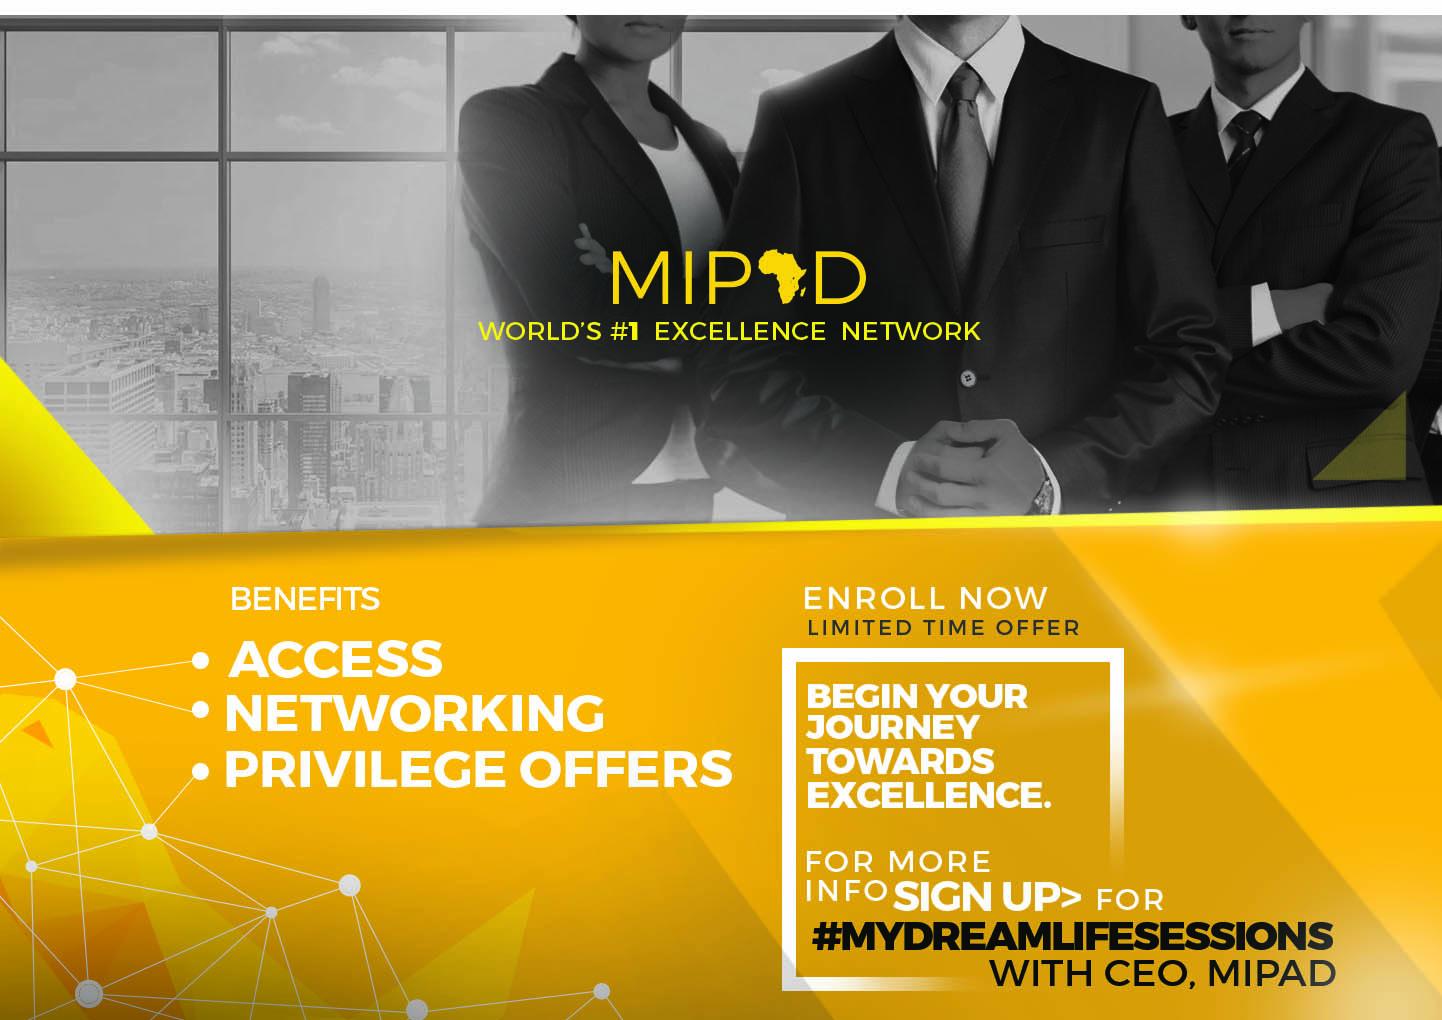 MIPAD Global Network Benefits